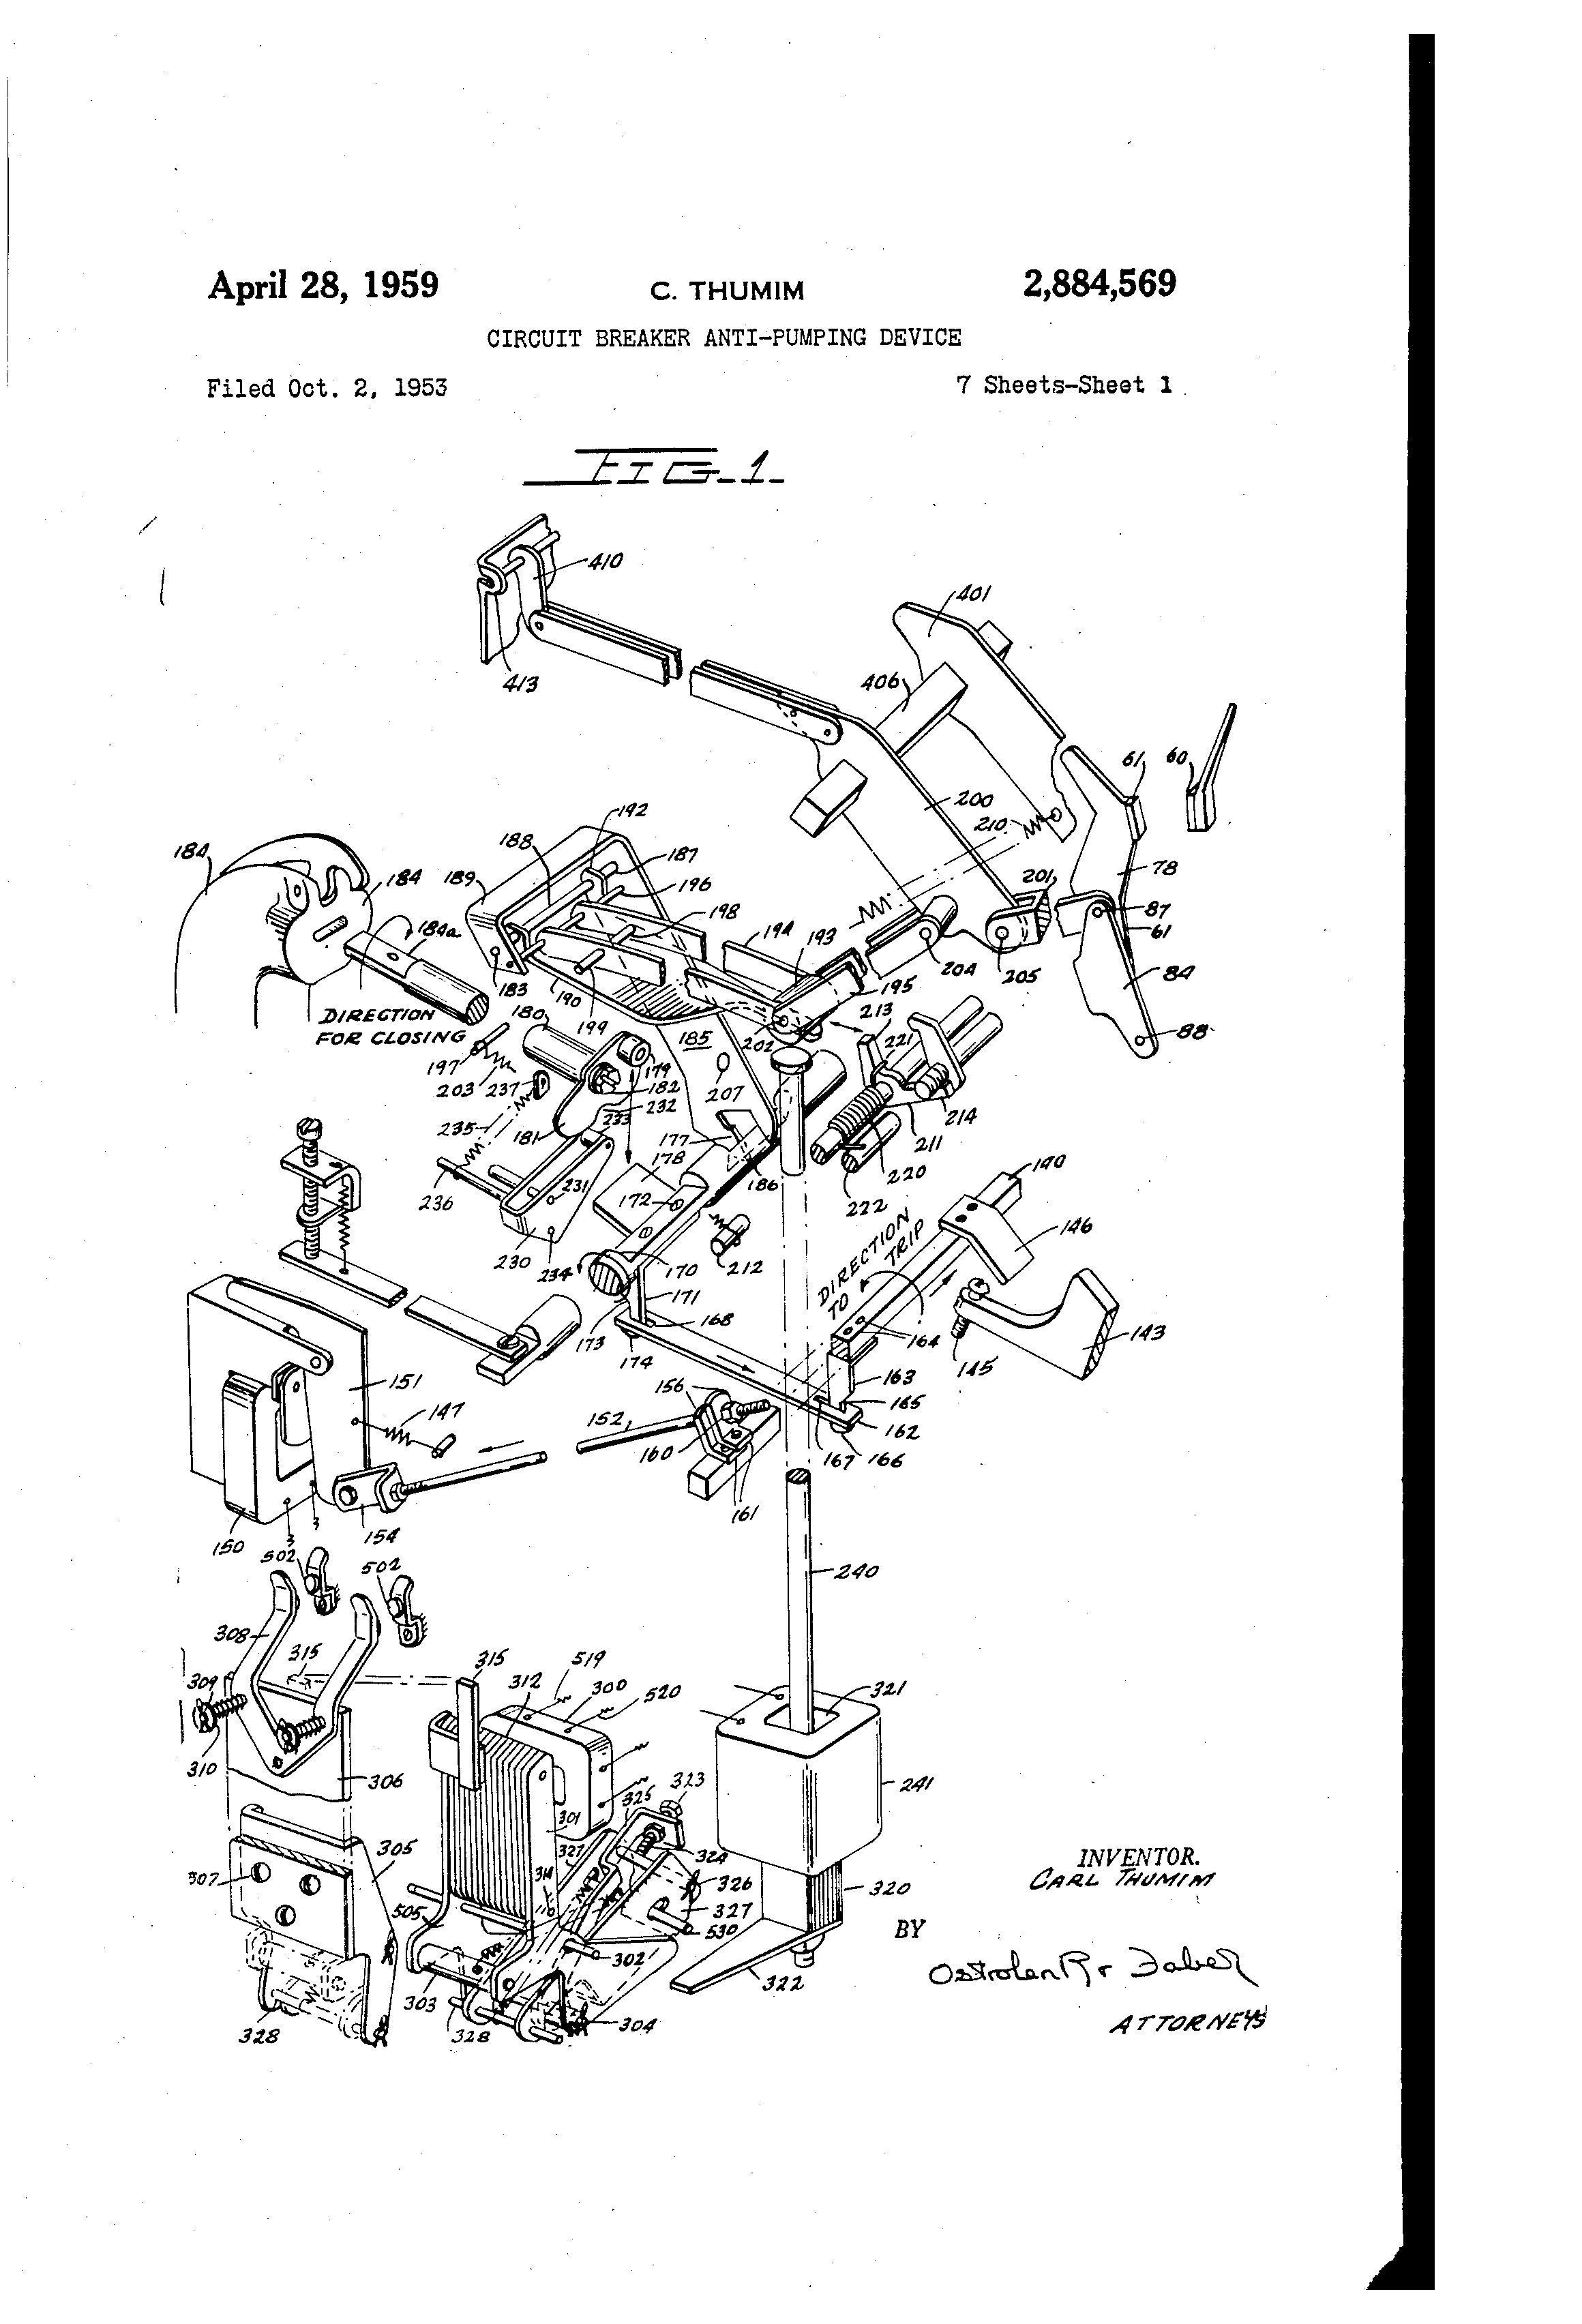 patent us2884569 - circuit breaker anti-pumping device